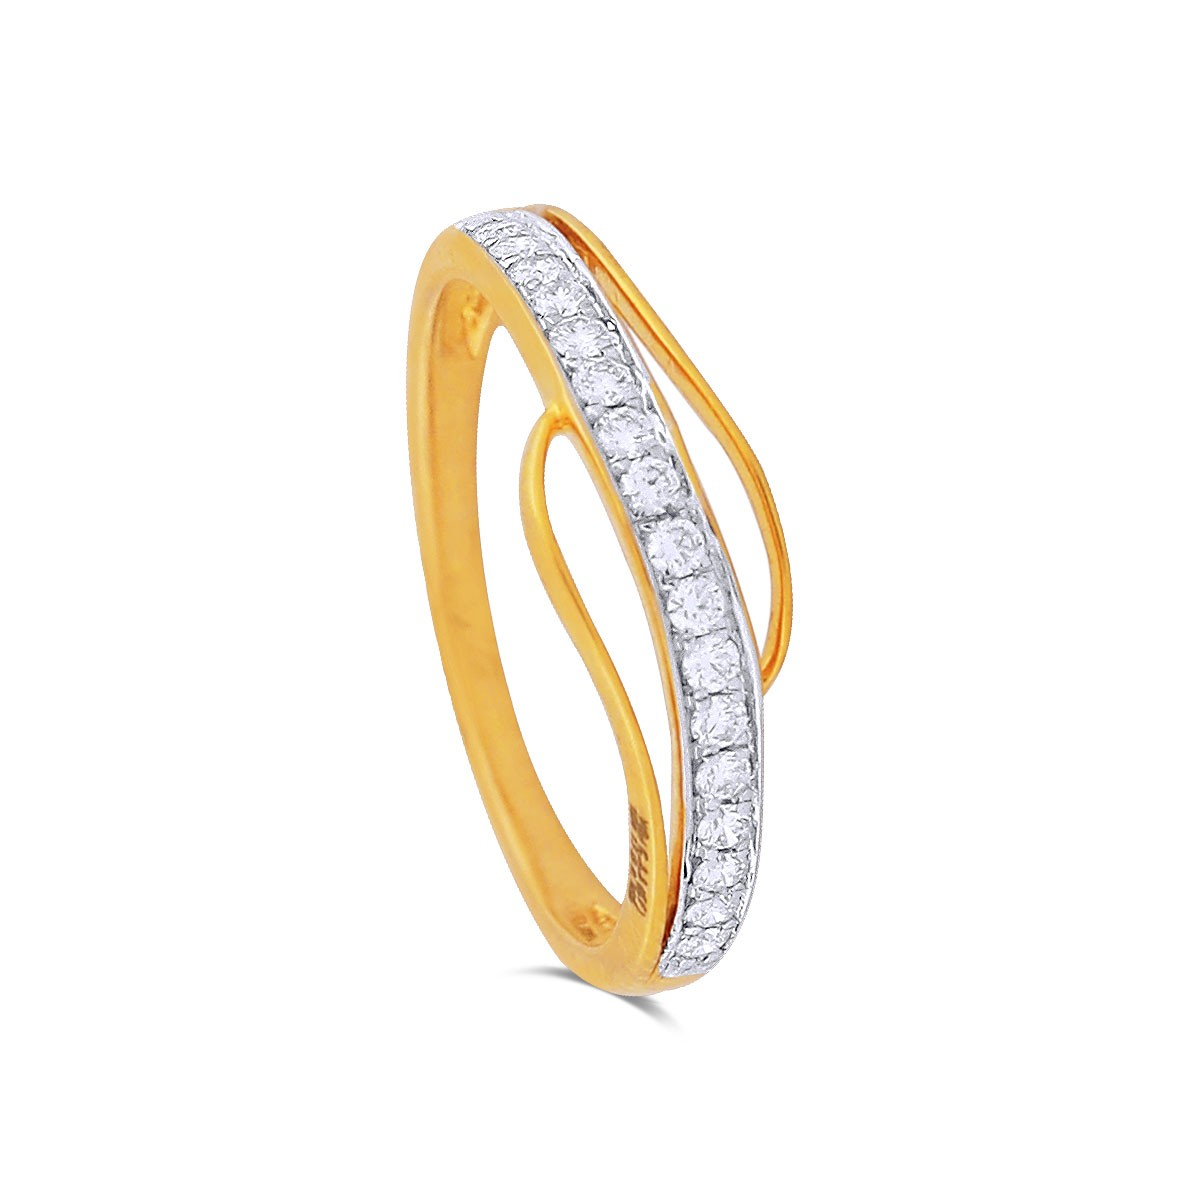 Lisa Yellow Gold Diamond Ring